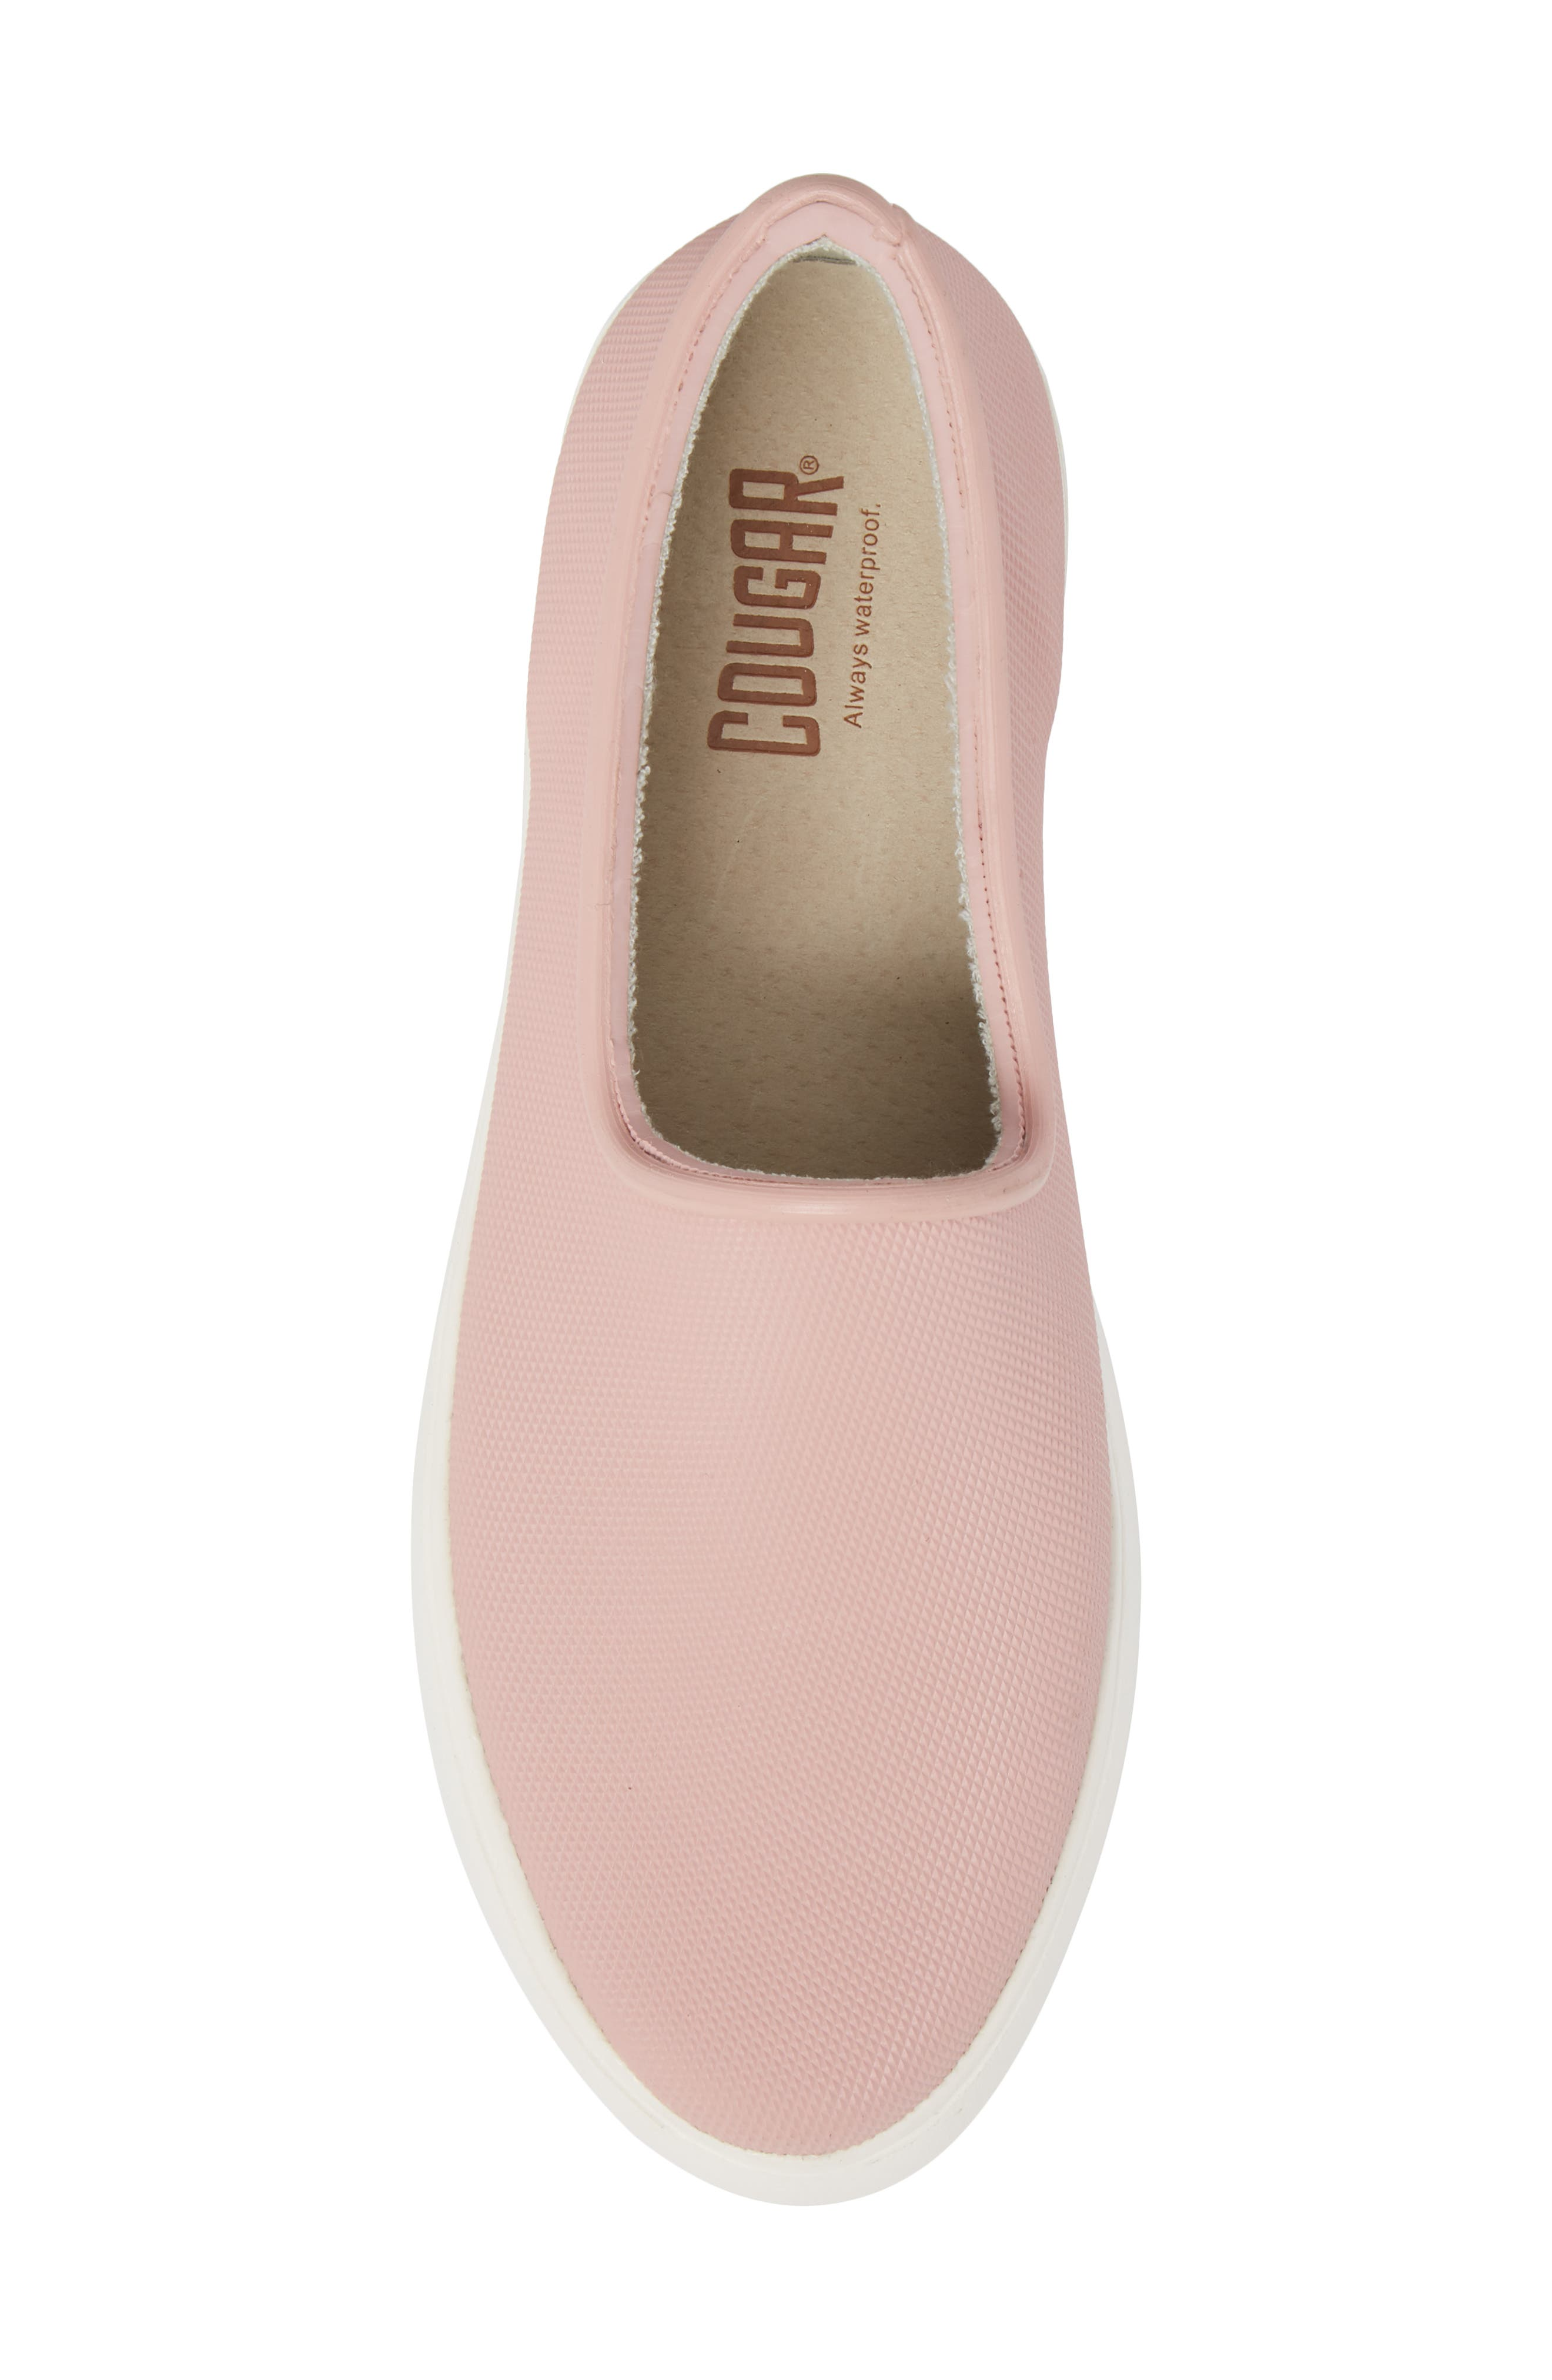 Rainy Day Waterproof Slip-On Sneaker,                             Alternate thumbnail 5, color,                             Dusty Pink